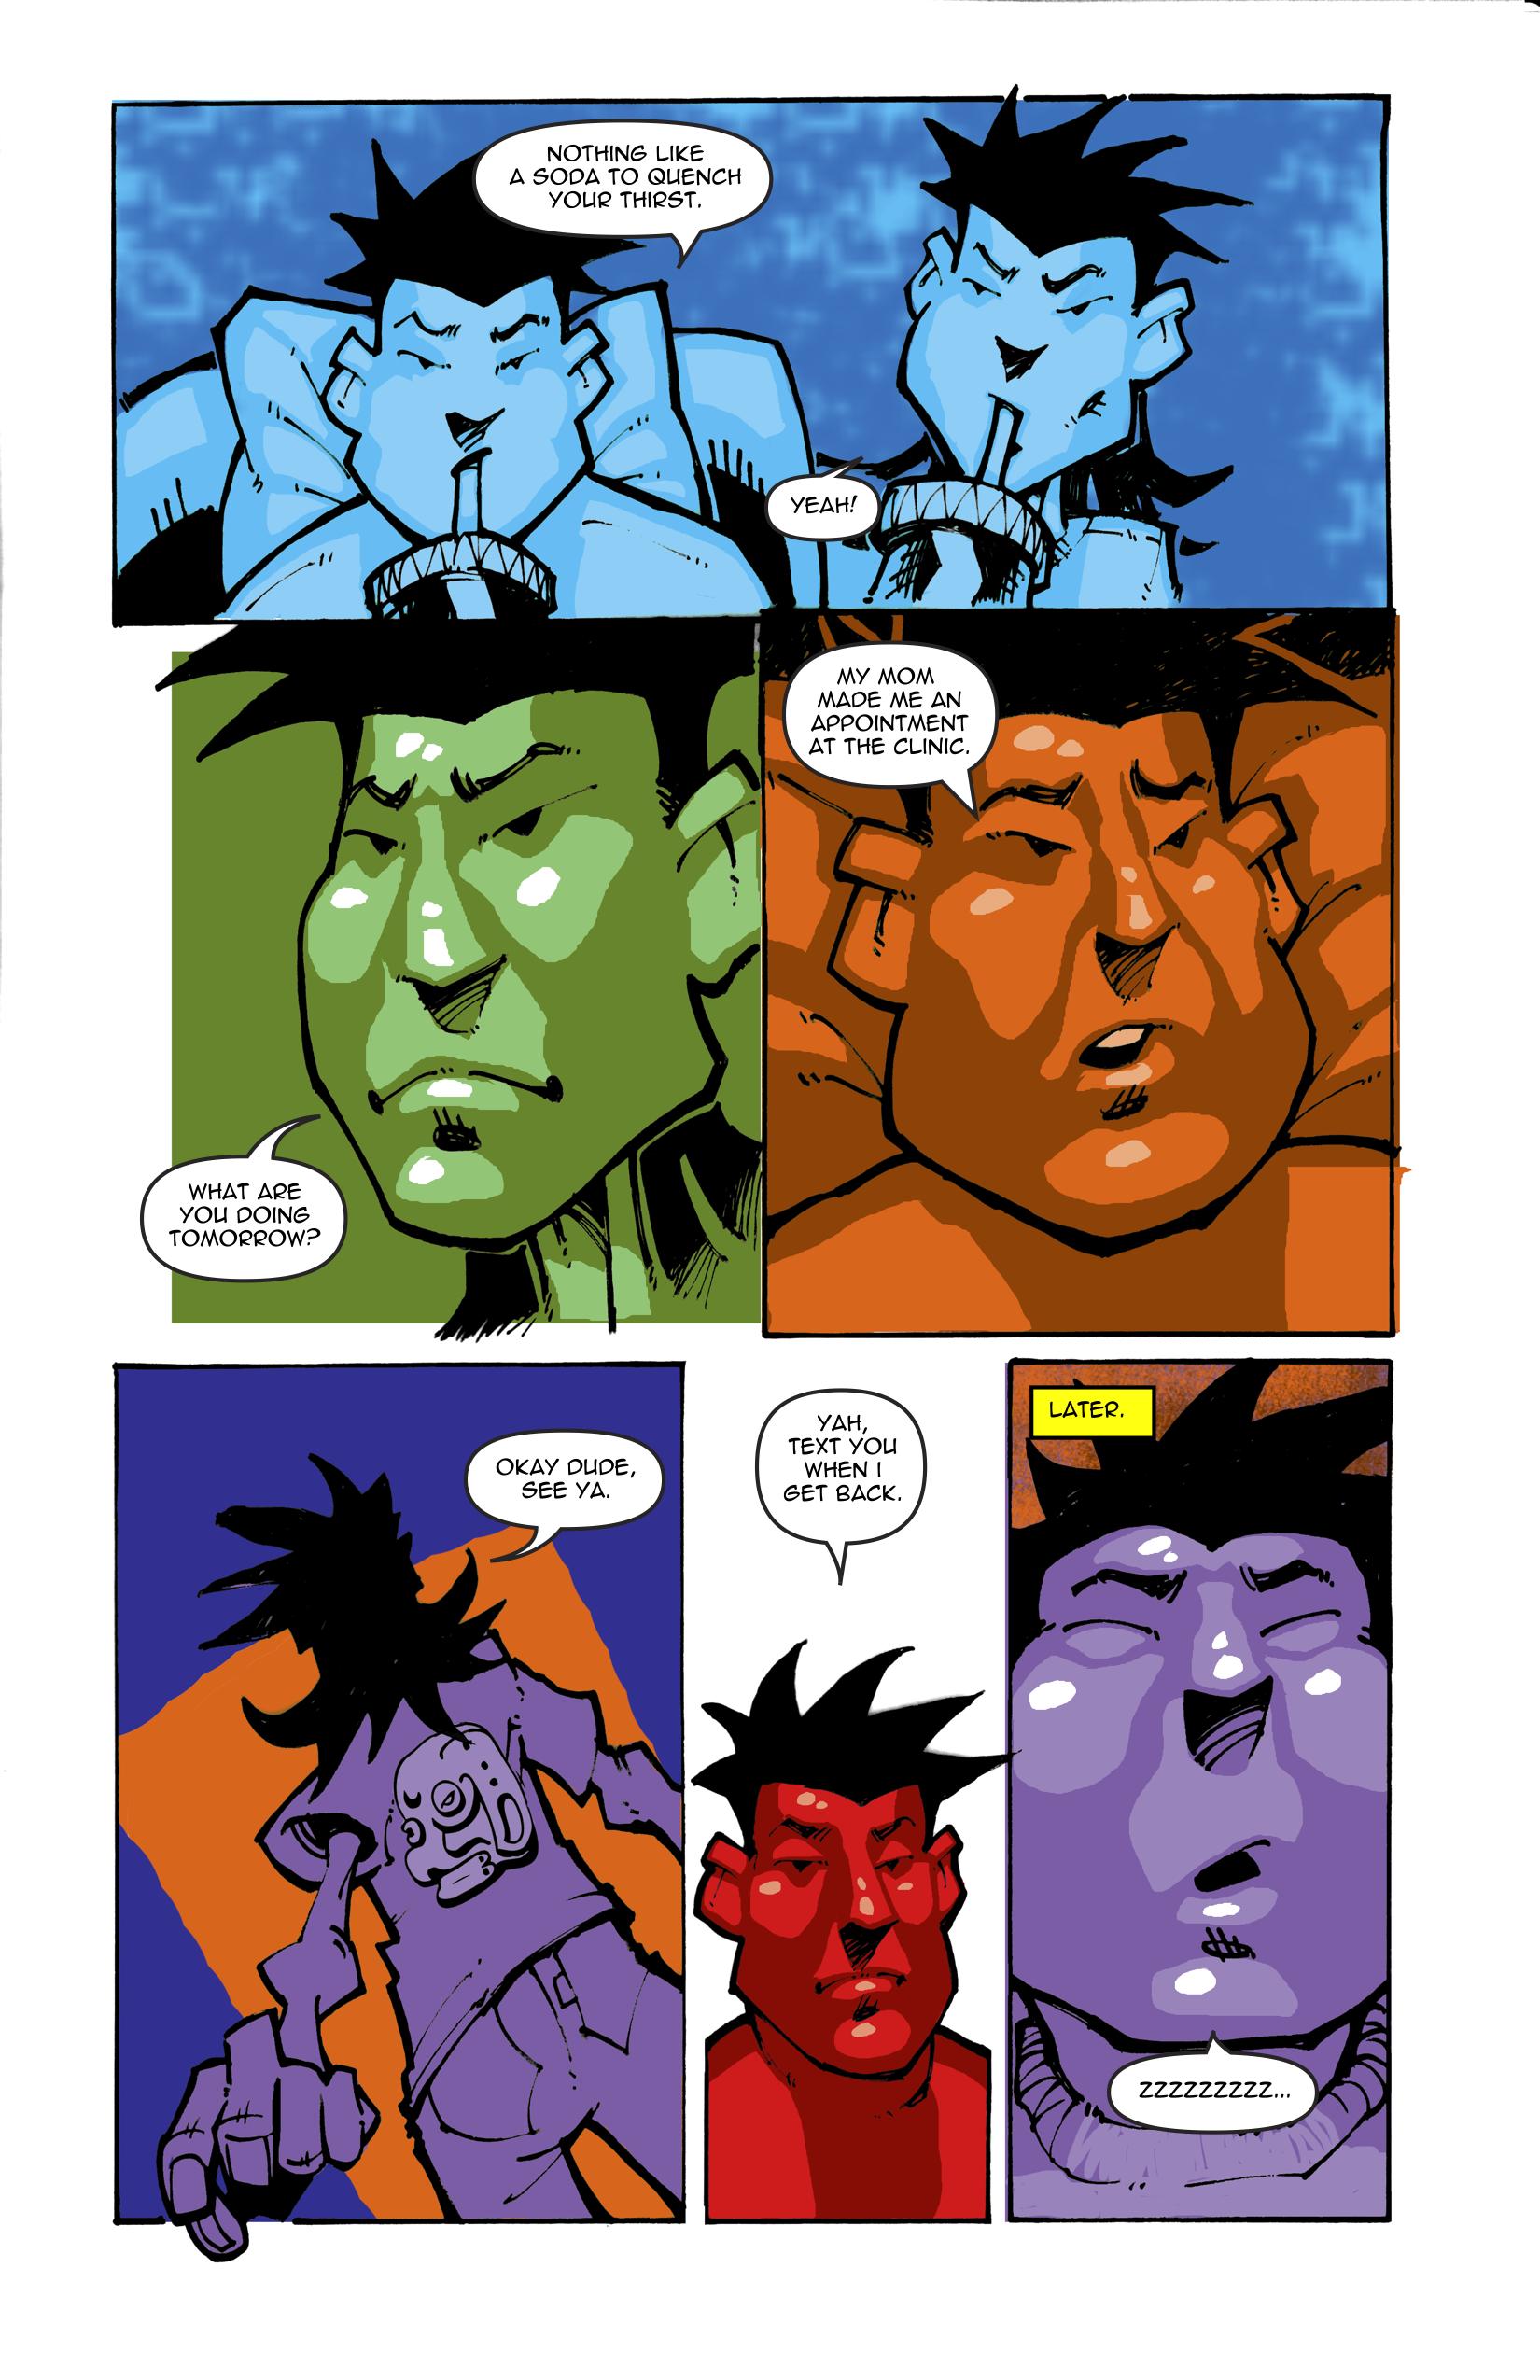 Page 10. Tomas leaves to go home. Brandon falls asleep.